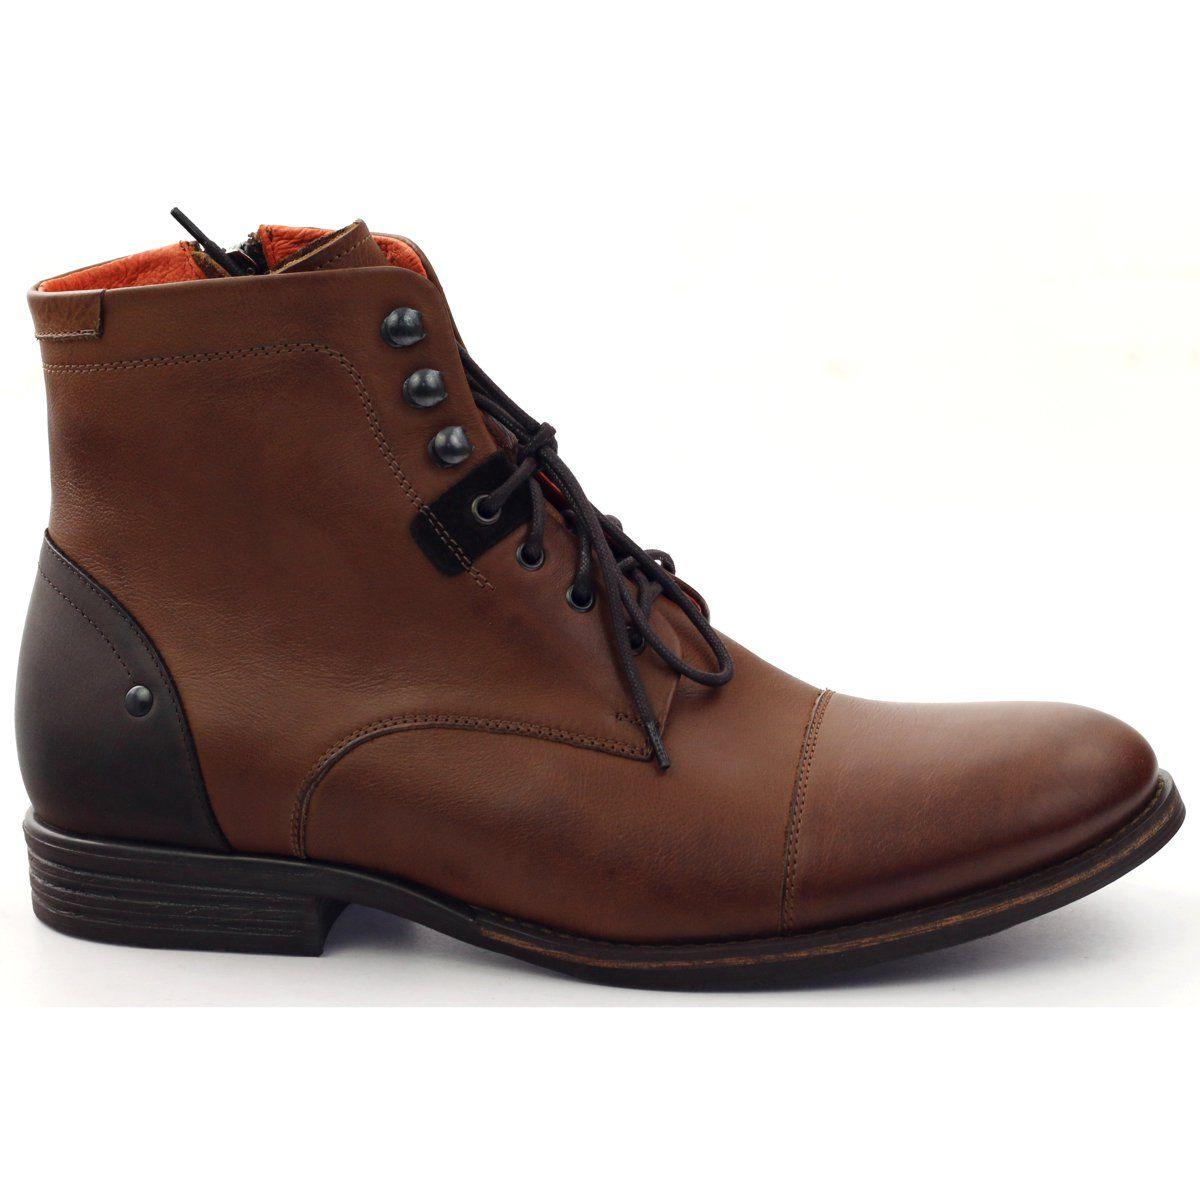 Botki Zimowe Wiazane Pilpol Pc6009 Brazowe Mens Leather Boots Boots Winter Boots